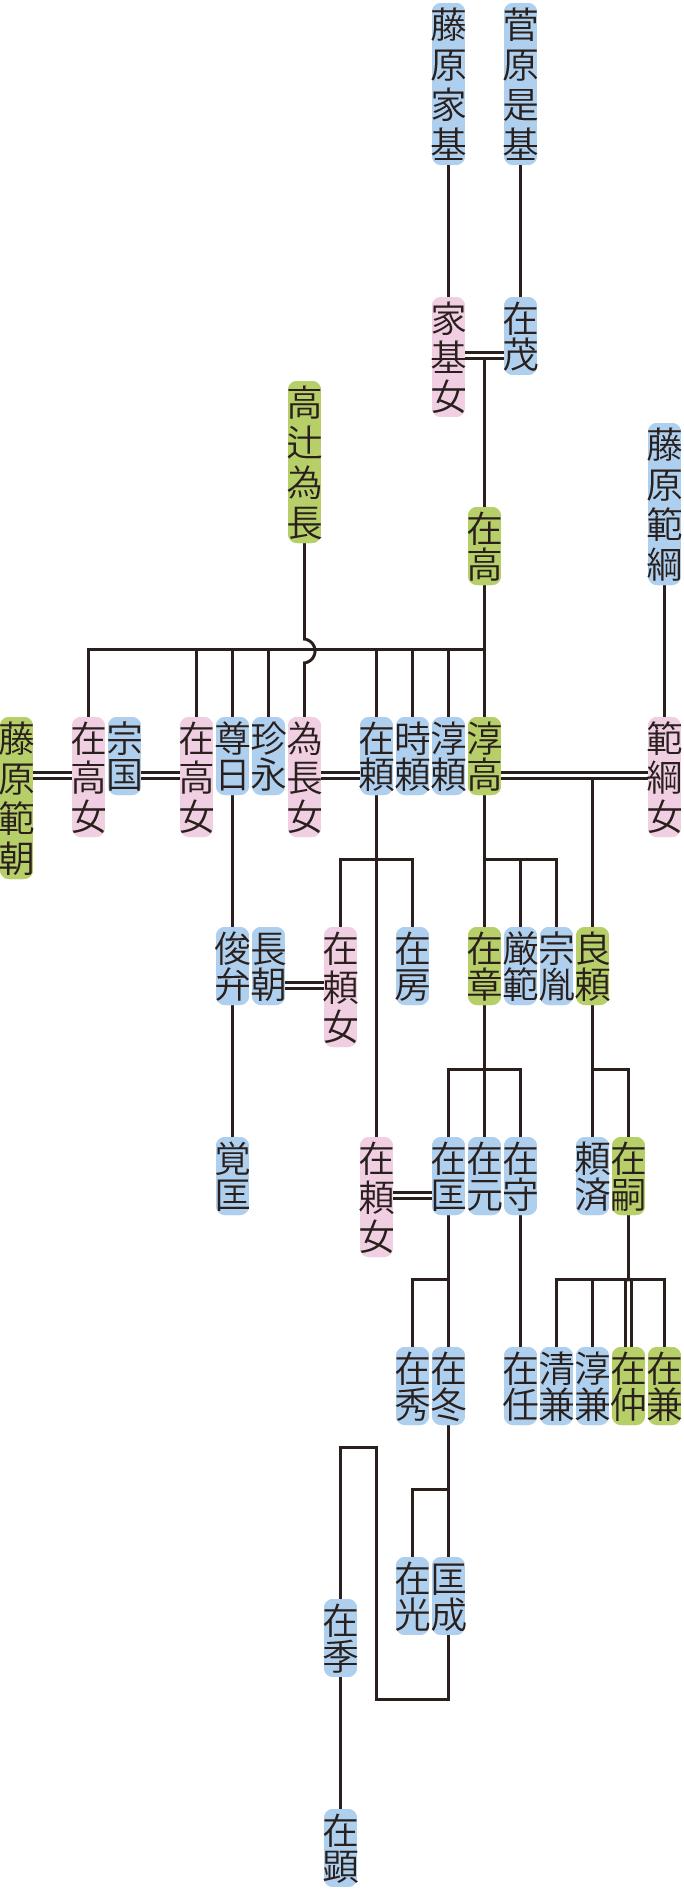 菅原在高~良頼の系図